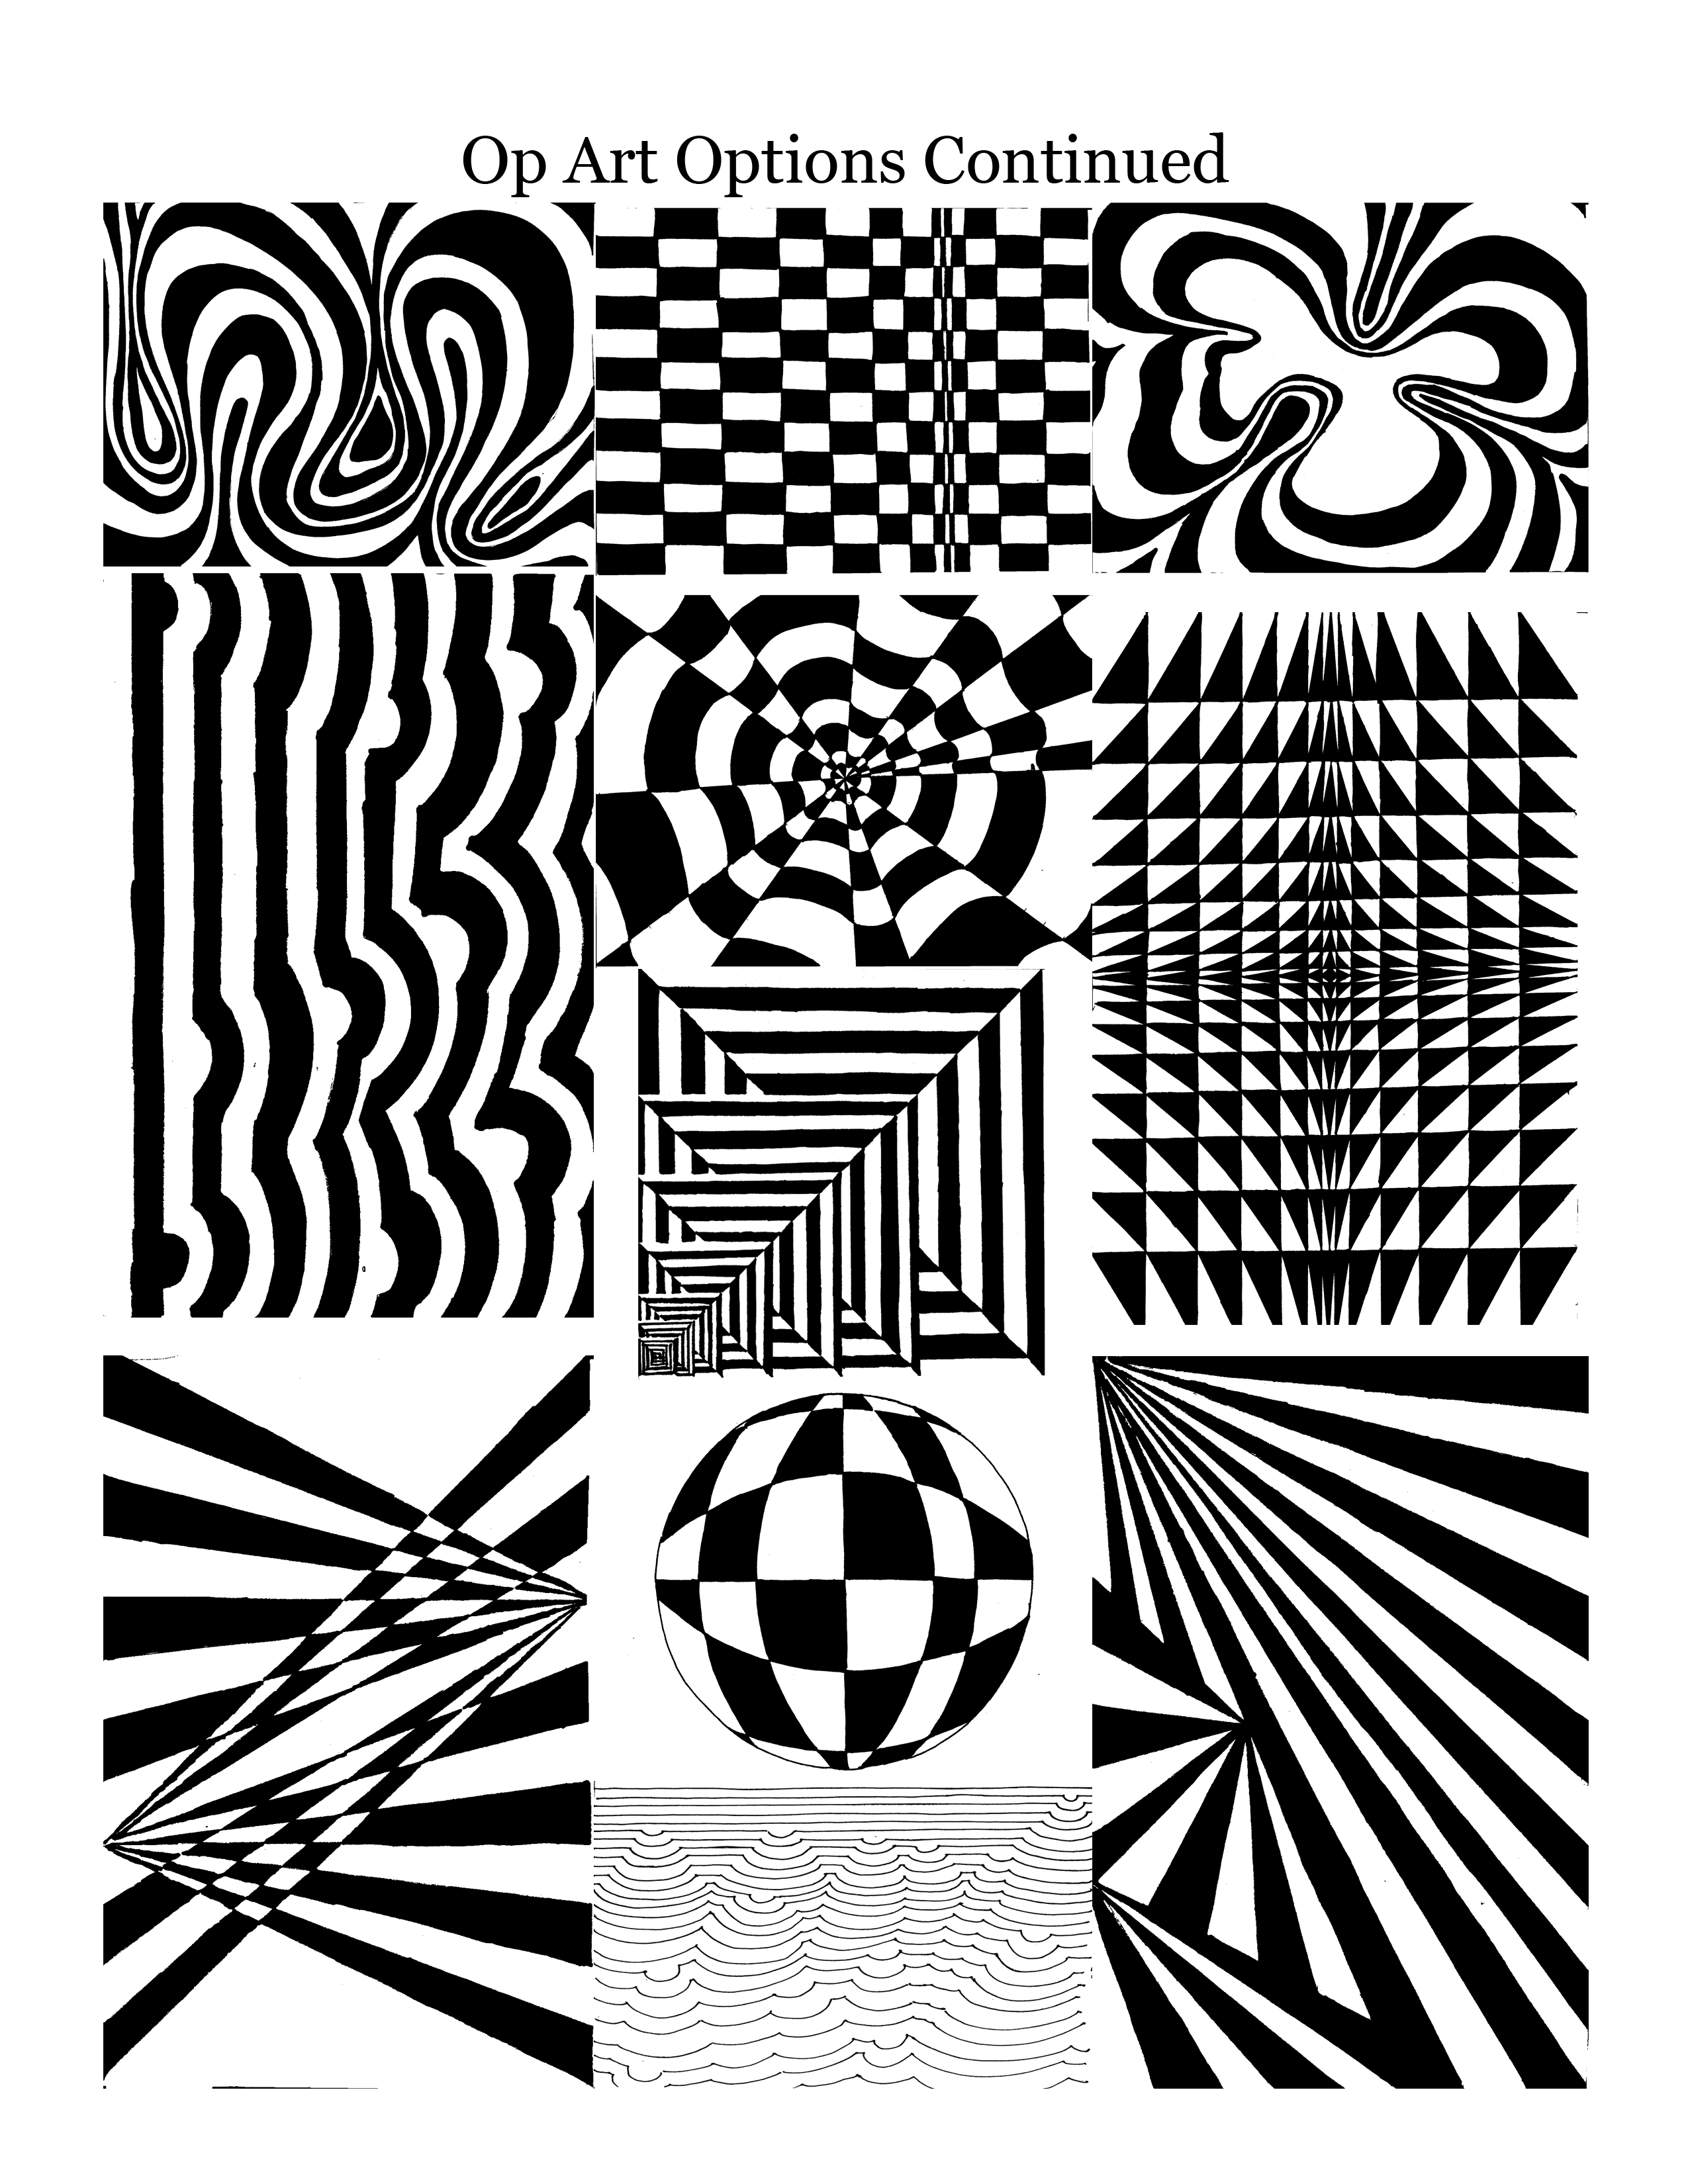 Optical Illusions Art! Art 8 - Art in Room A124 | Op art ...